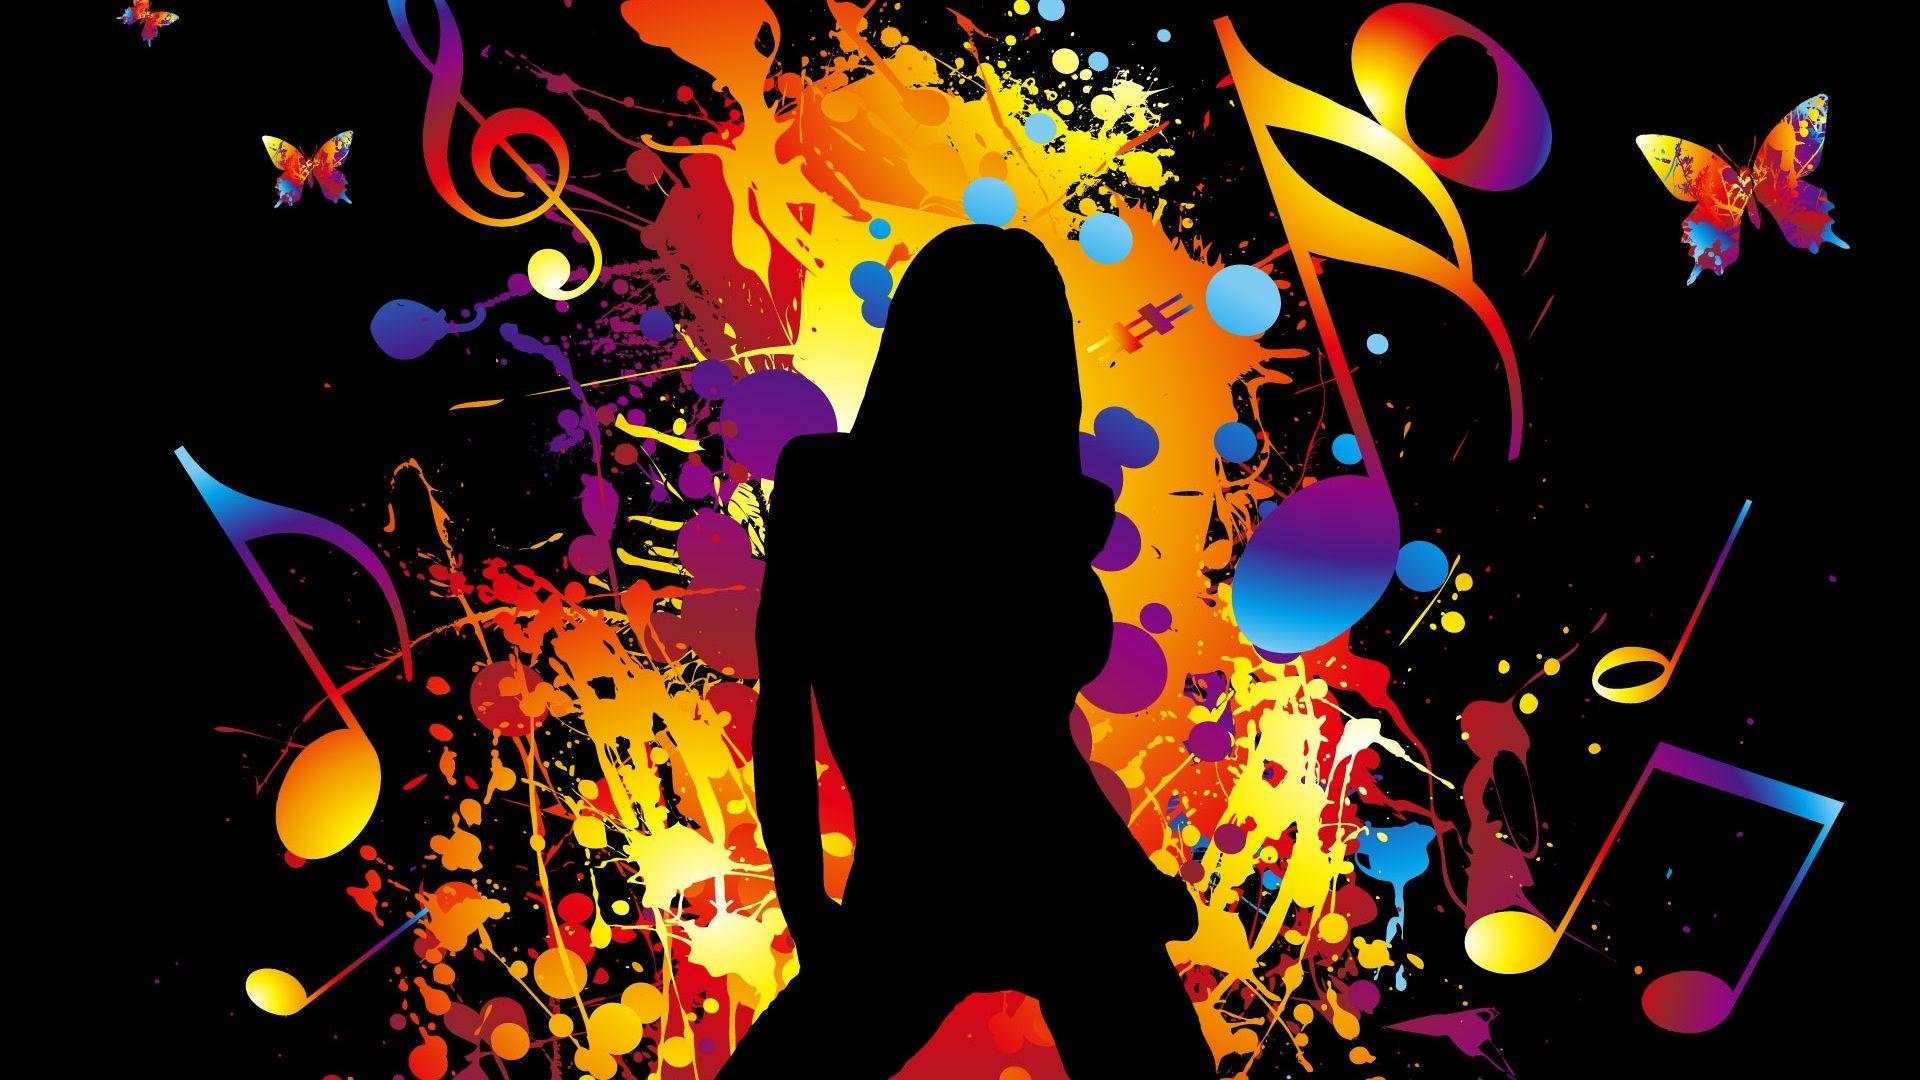 Best Wallpaper Music Bright - a5a24f3eac76b318c762cdeed4039592  Image_798663.jpg